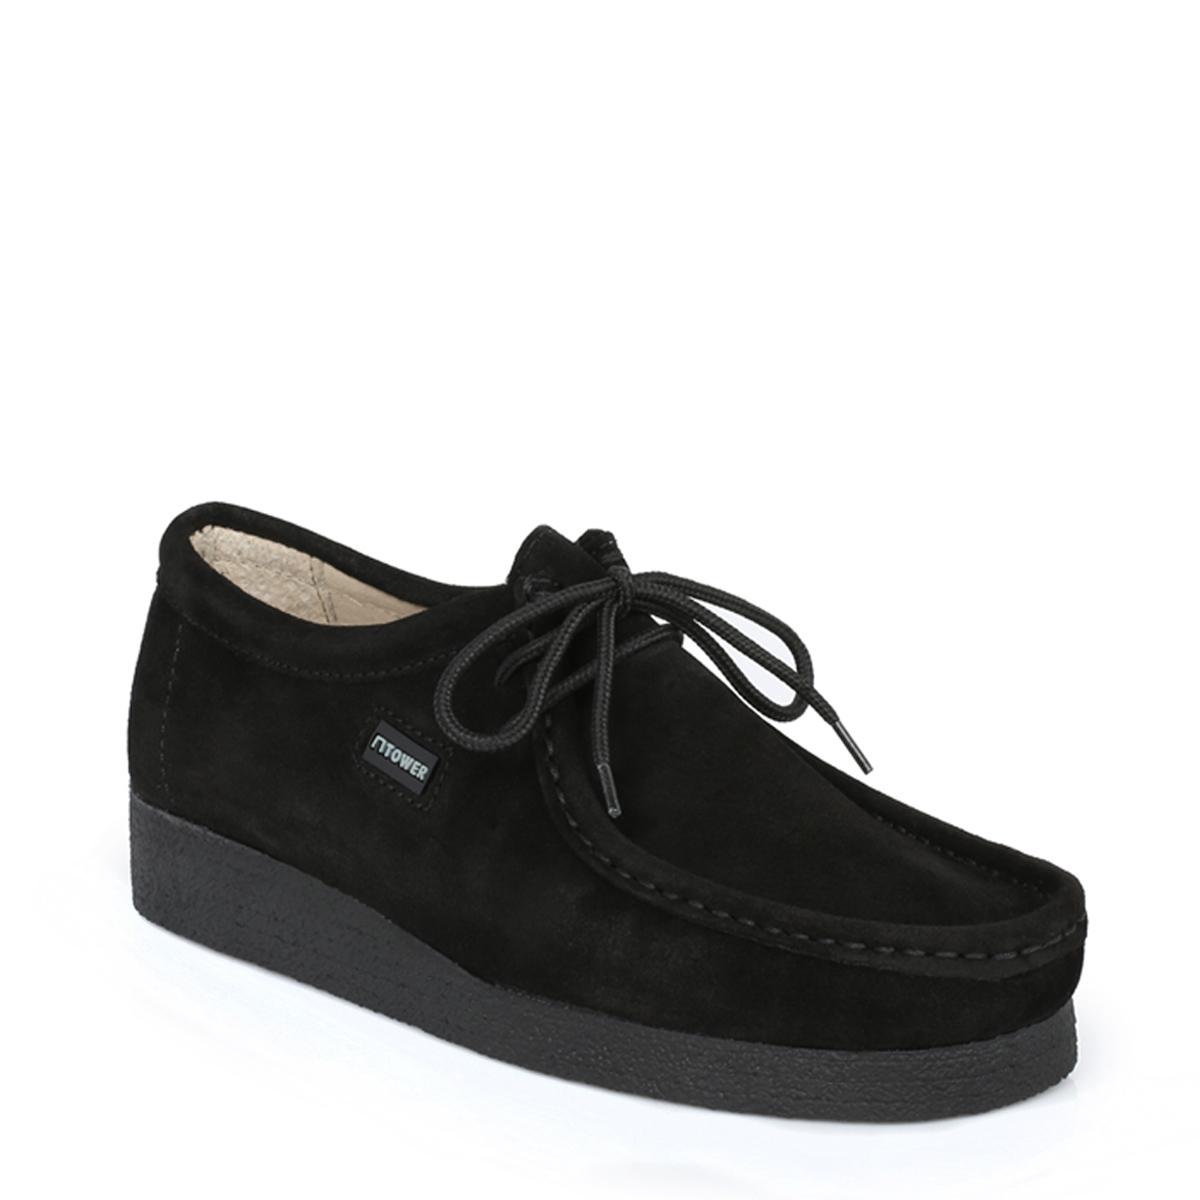 Tower London Mens Shoes Black Lace Up